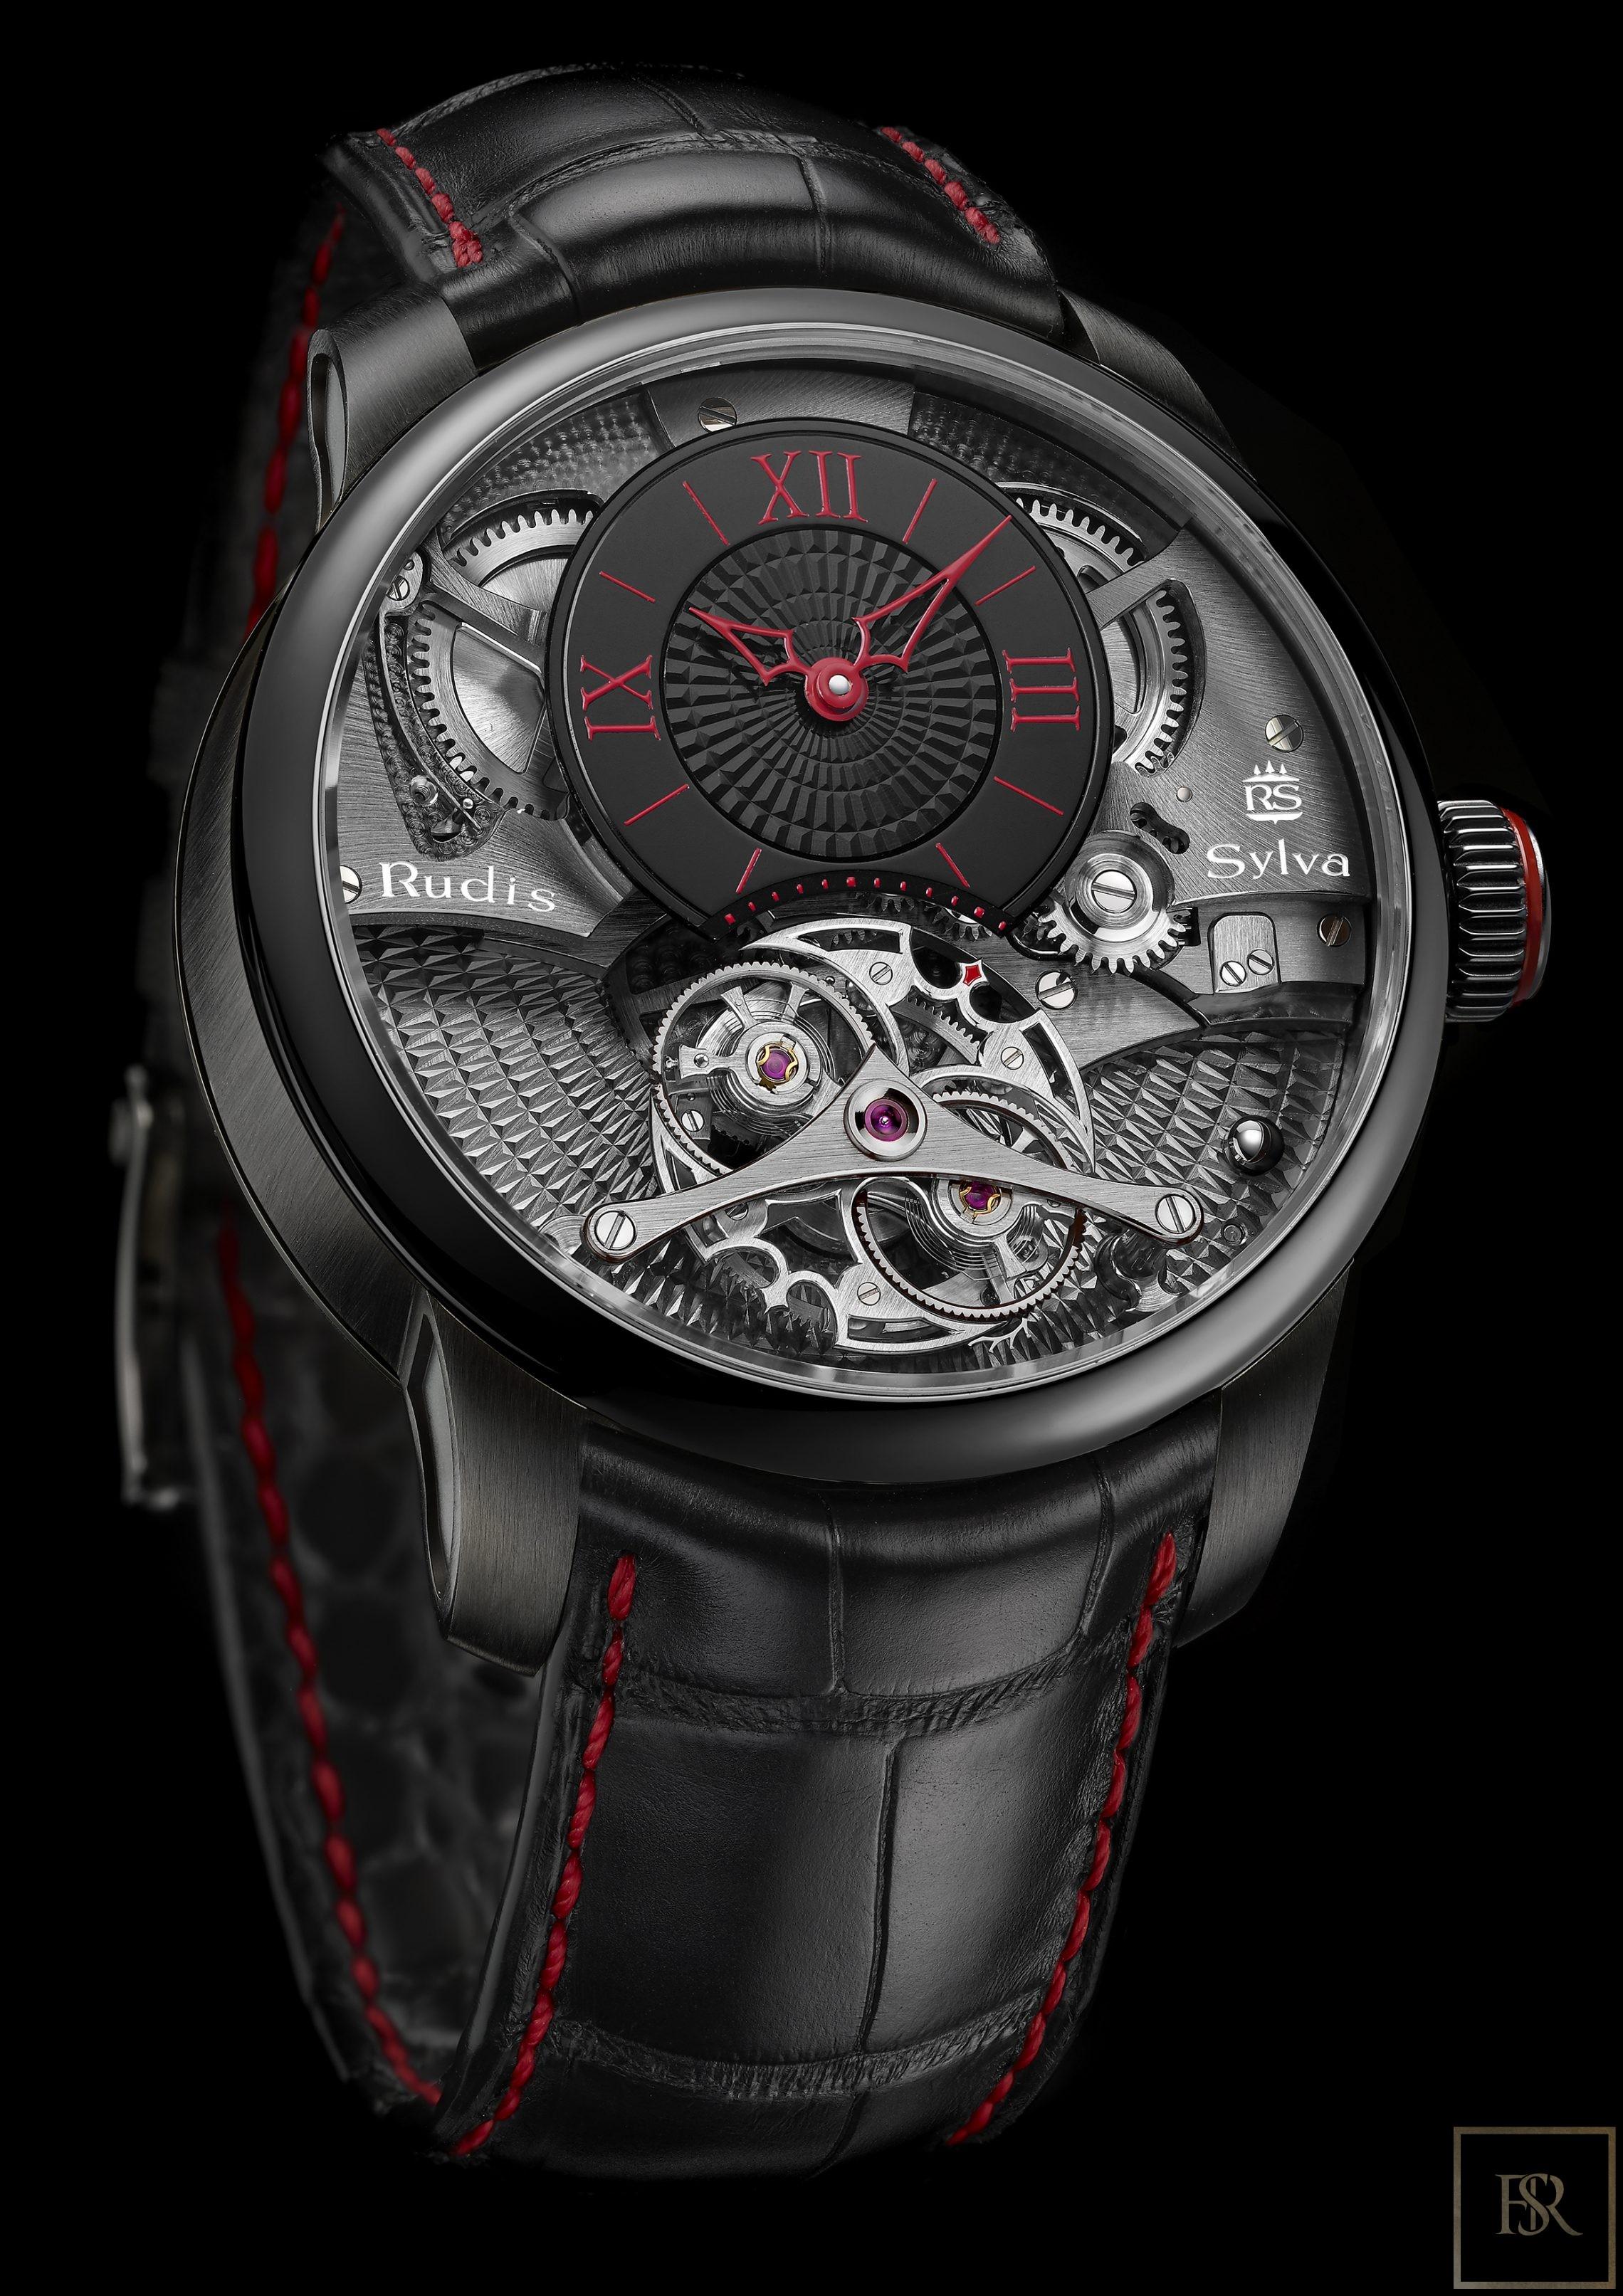 Watch RS14 Black Titanium - RUDIS SYLVA  for sale For Super Rich